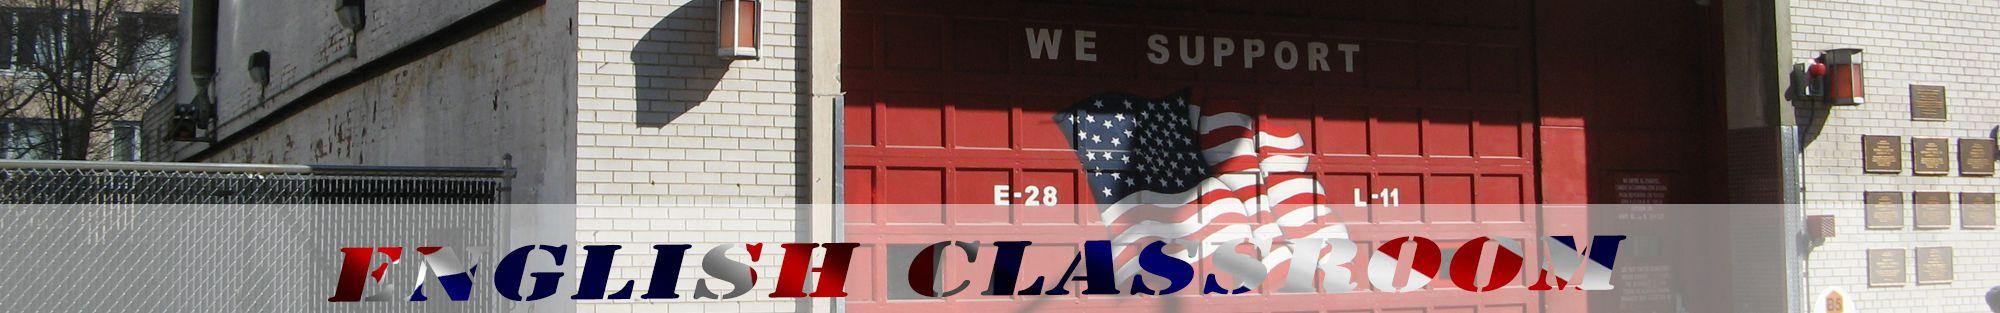 new york city fire department header english classroom